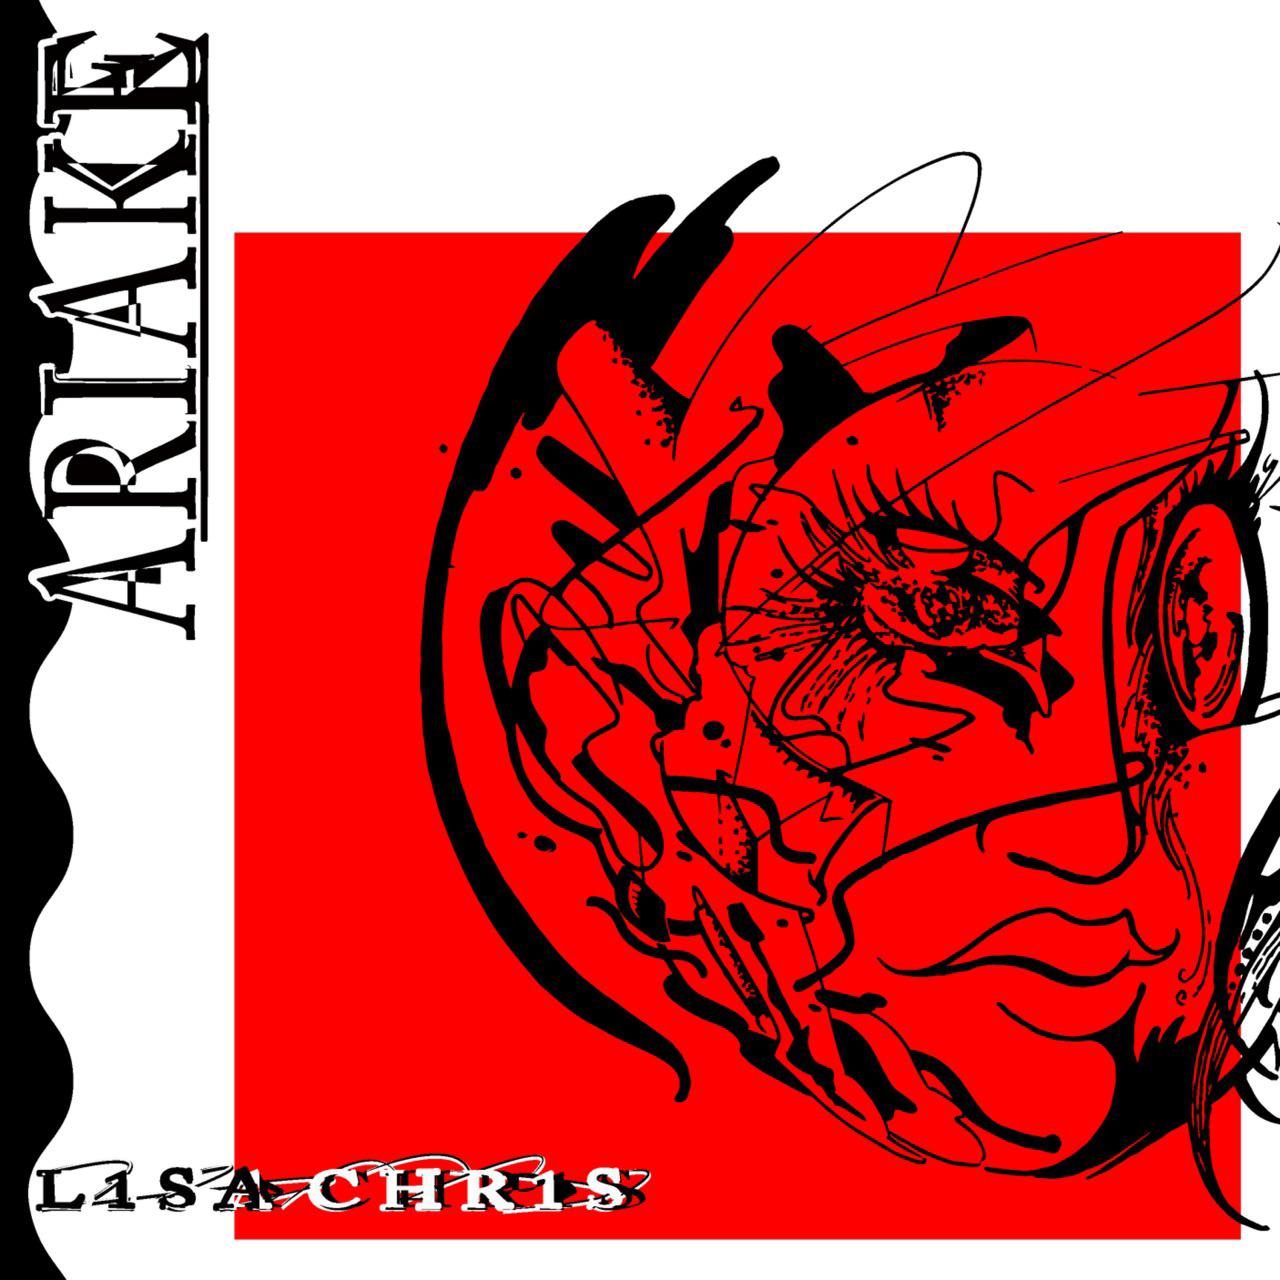 LISACHRIS ファースト EP ARIAKE リリース